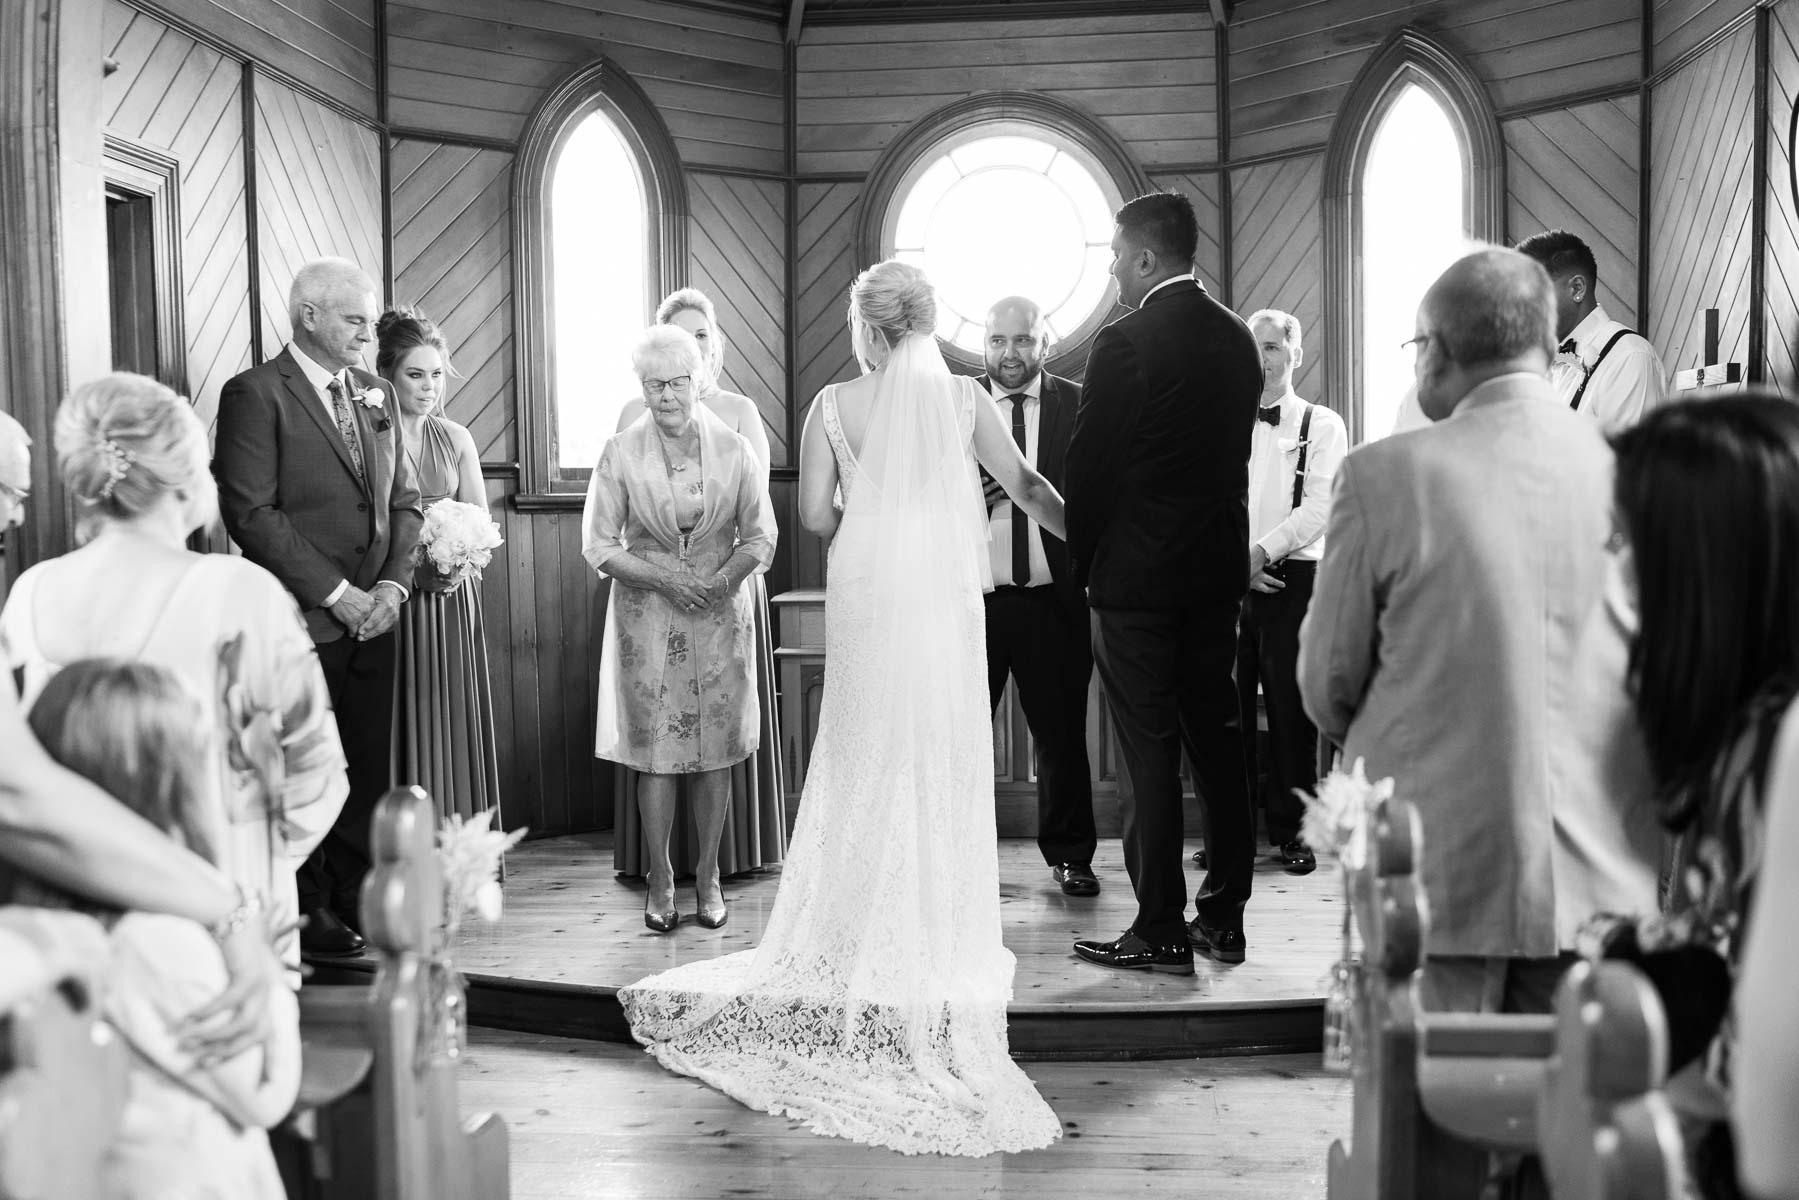 trenavin-chapel-phillip-island-wedding-heart+soul-weddings-sally-sean-00169.jpg